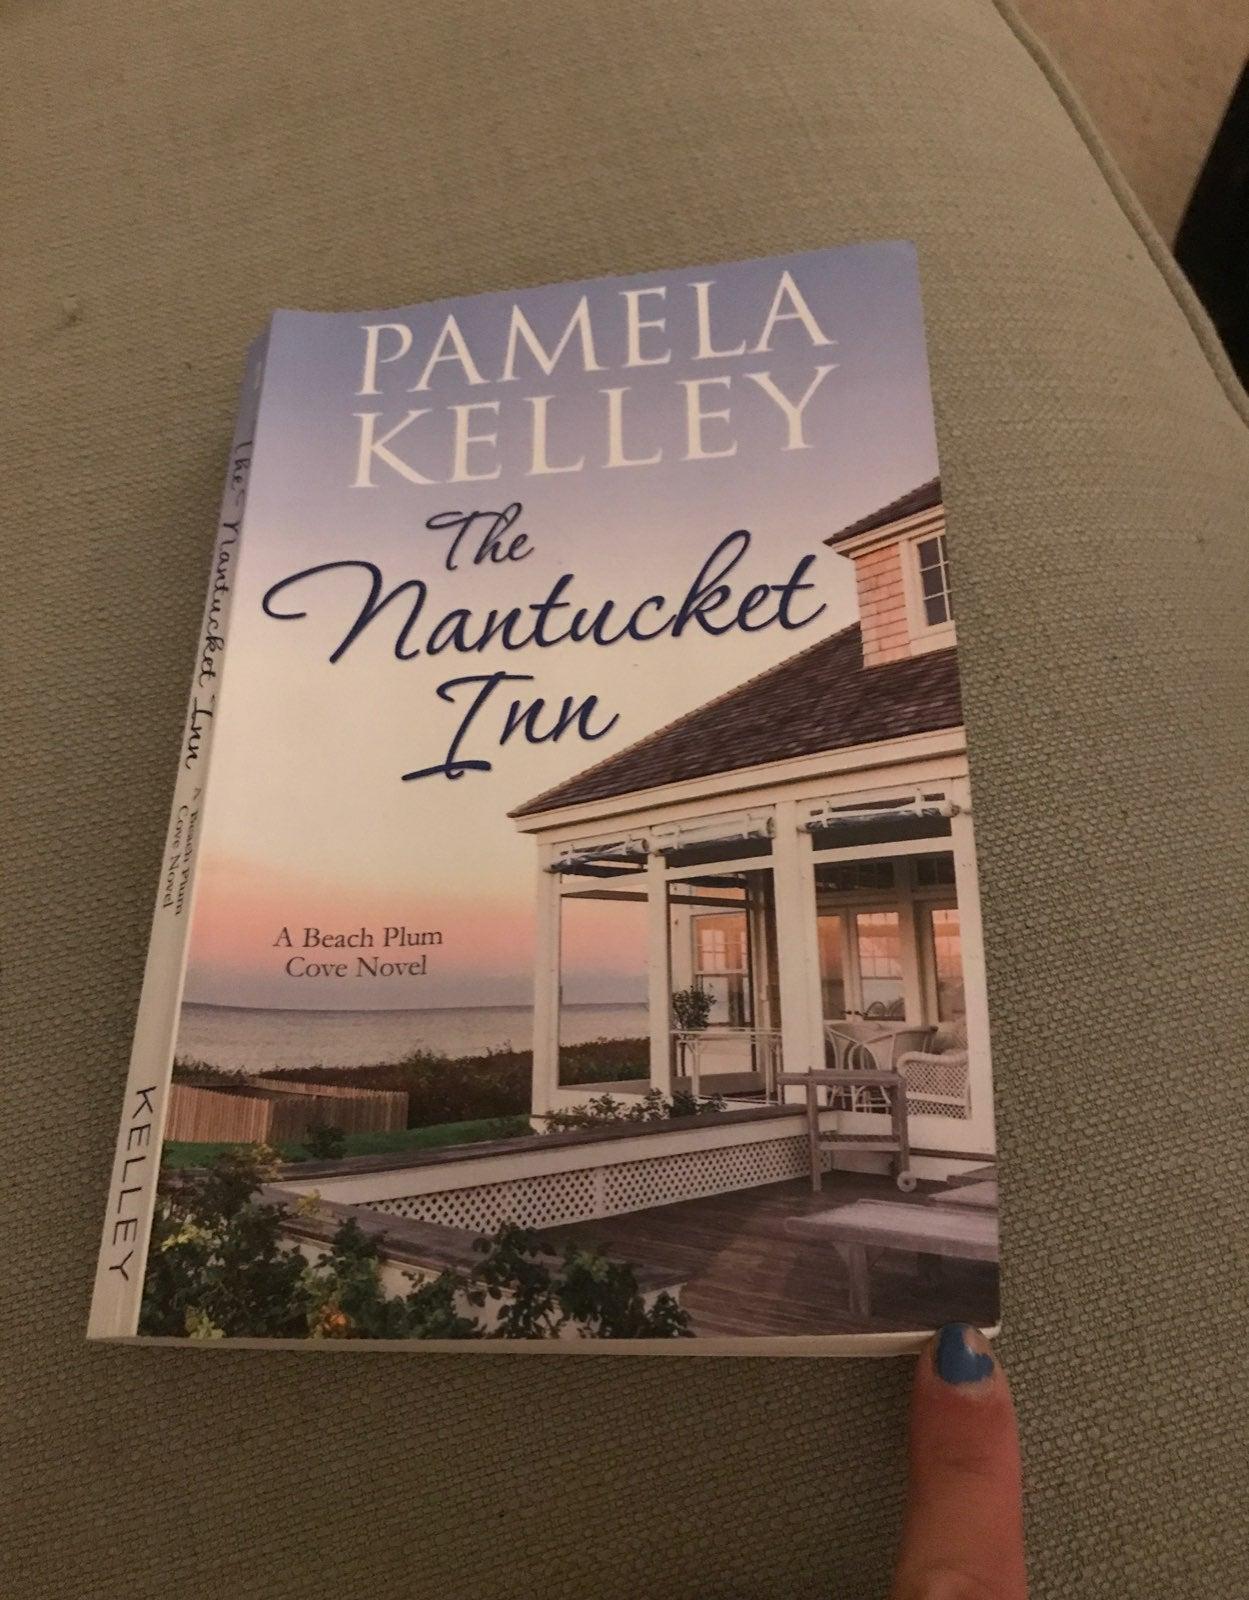 The Nantucket Inn by Pamela Kelley